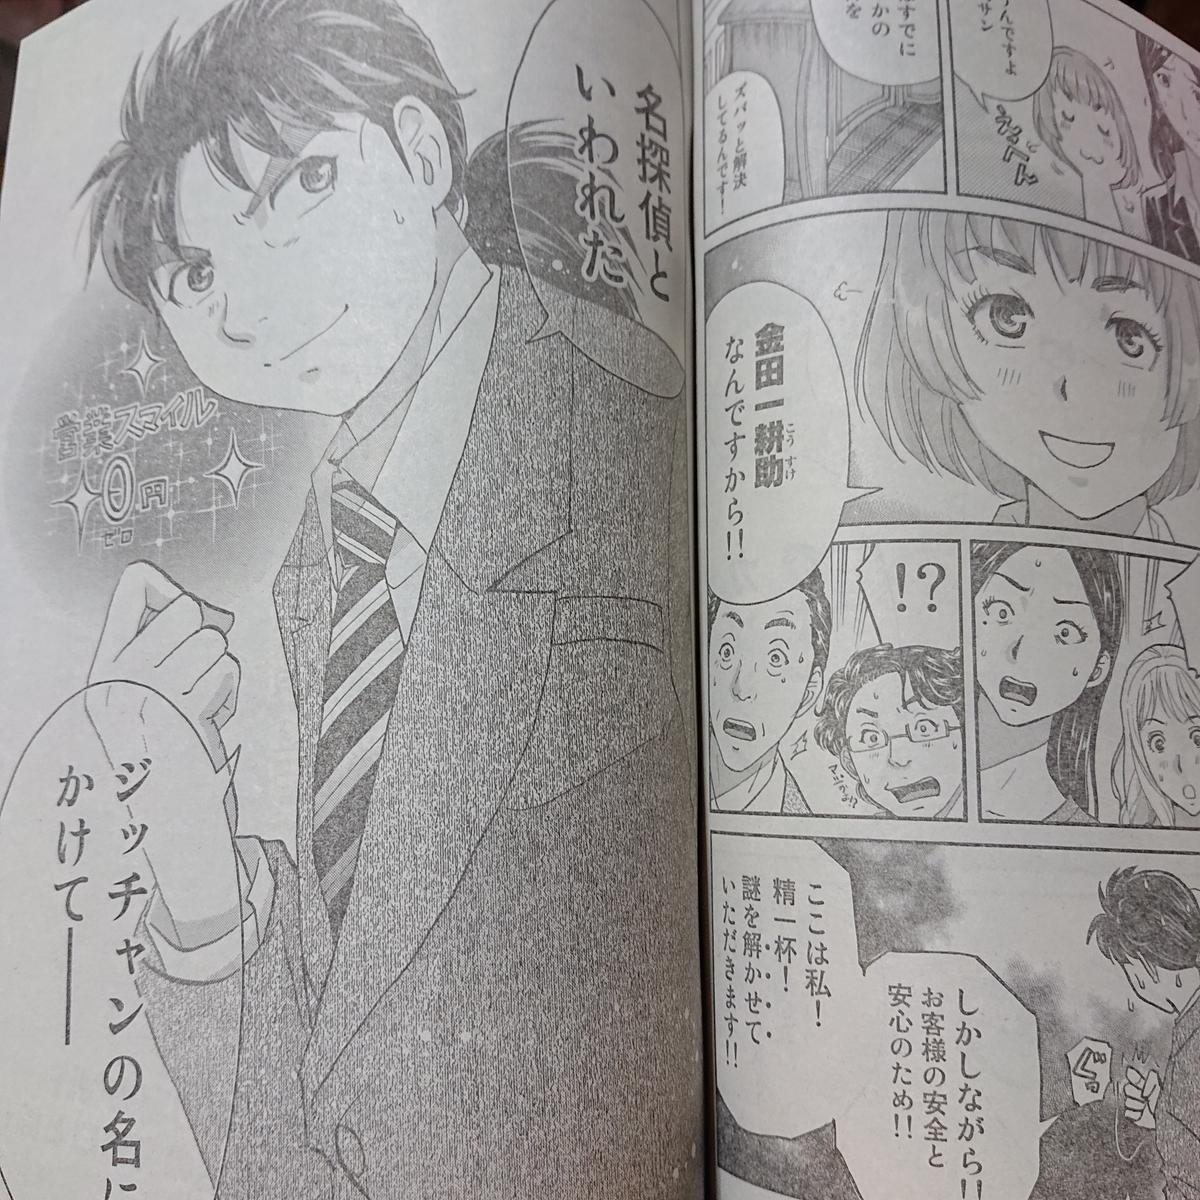 f:id:shikokumimami1:20200715201417j:plain